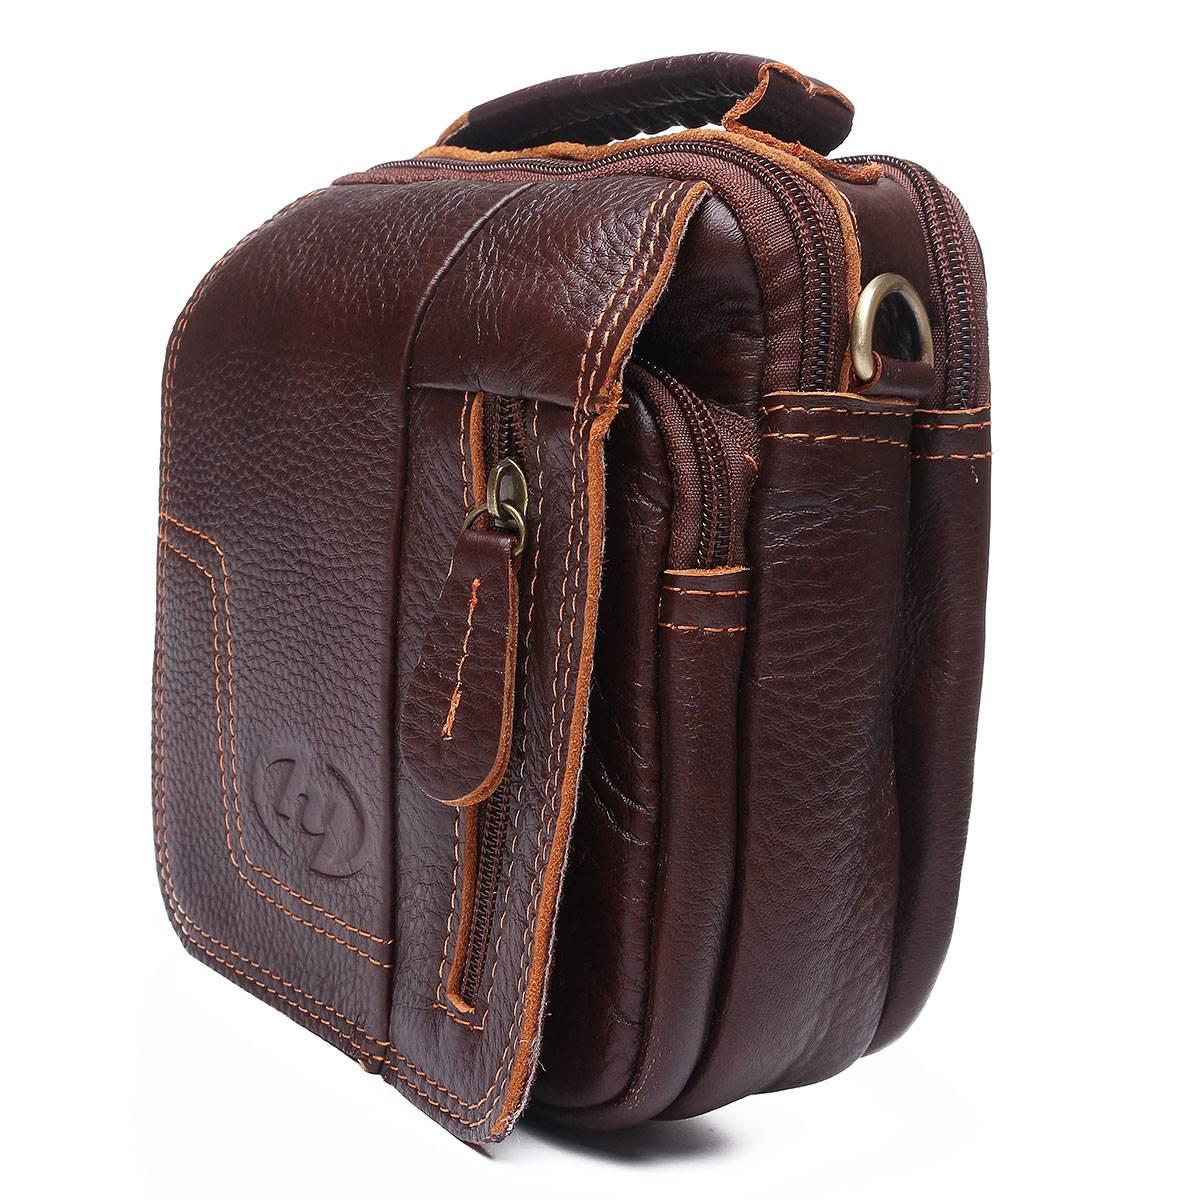 ФОТО 100% Genuine Leather Men's Bags Crossbody Vintage Style Brand Design Small Male Shoulder Handbags Business Brown Men Sling Bag